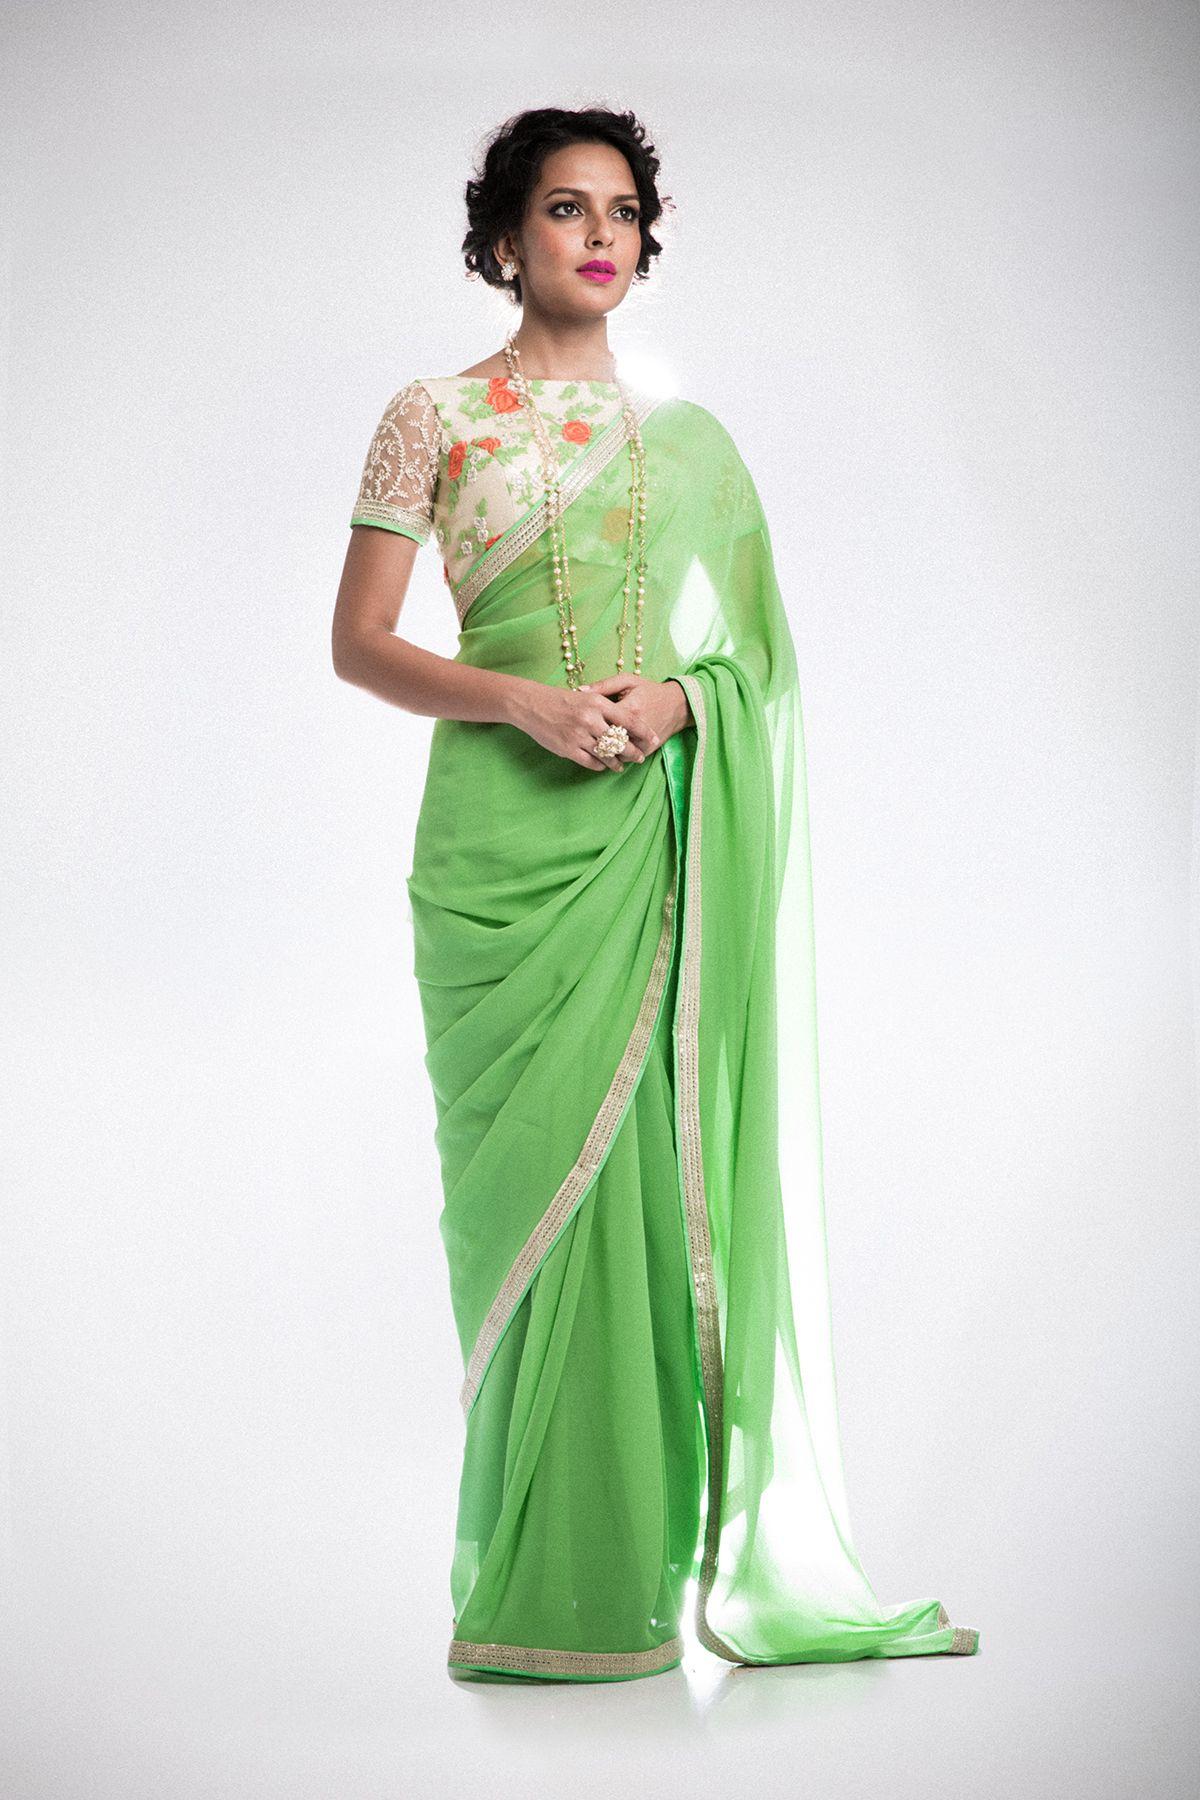 Women fashion saree swatimanish on behance  sareesblouses  pinterest  indian wear